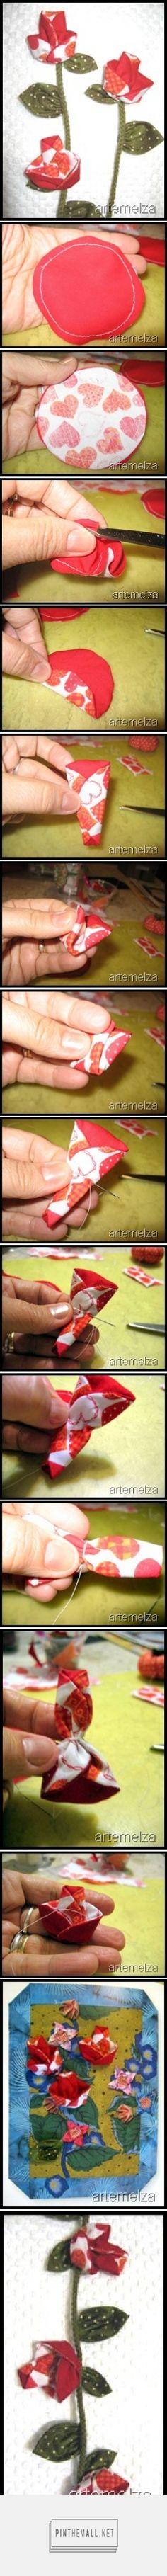 ARTEMELZA - Arte e Artesanato: Flor de fuxico série origami – passo a passo | Origami series yo-yo flower... - a grouped images picture - Pin Them All